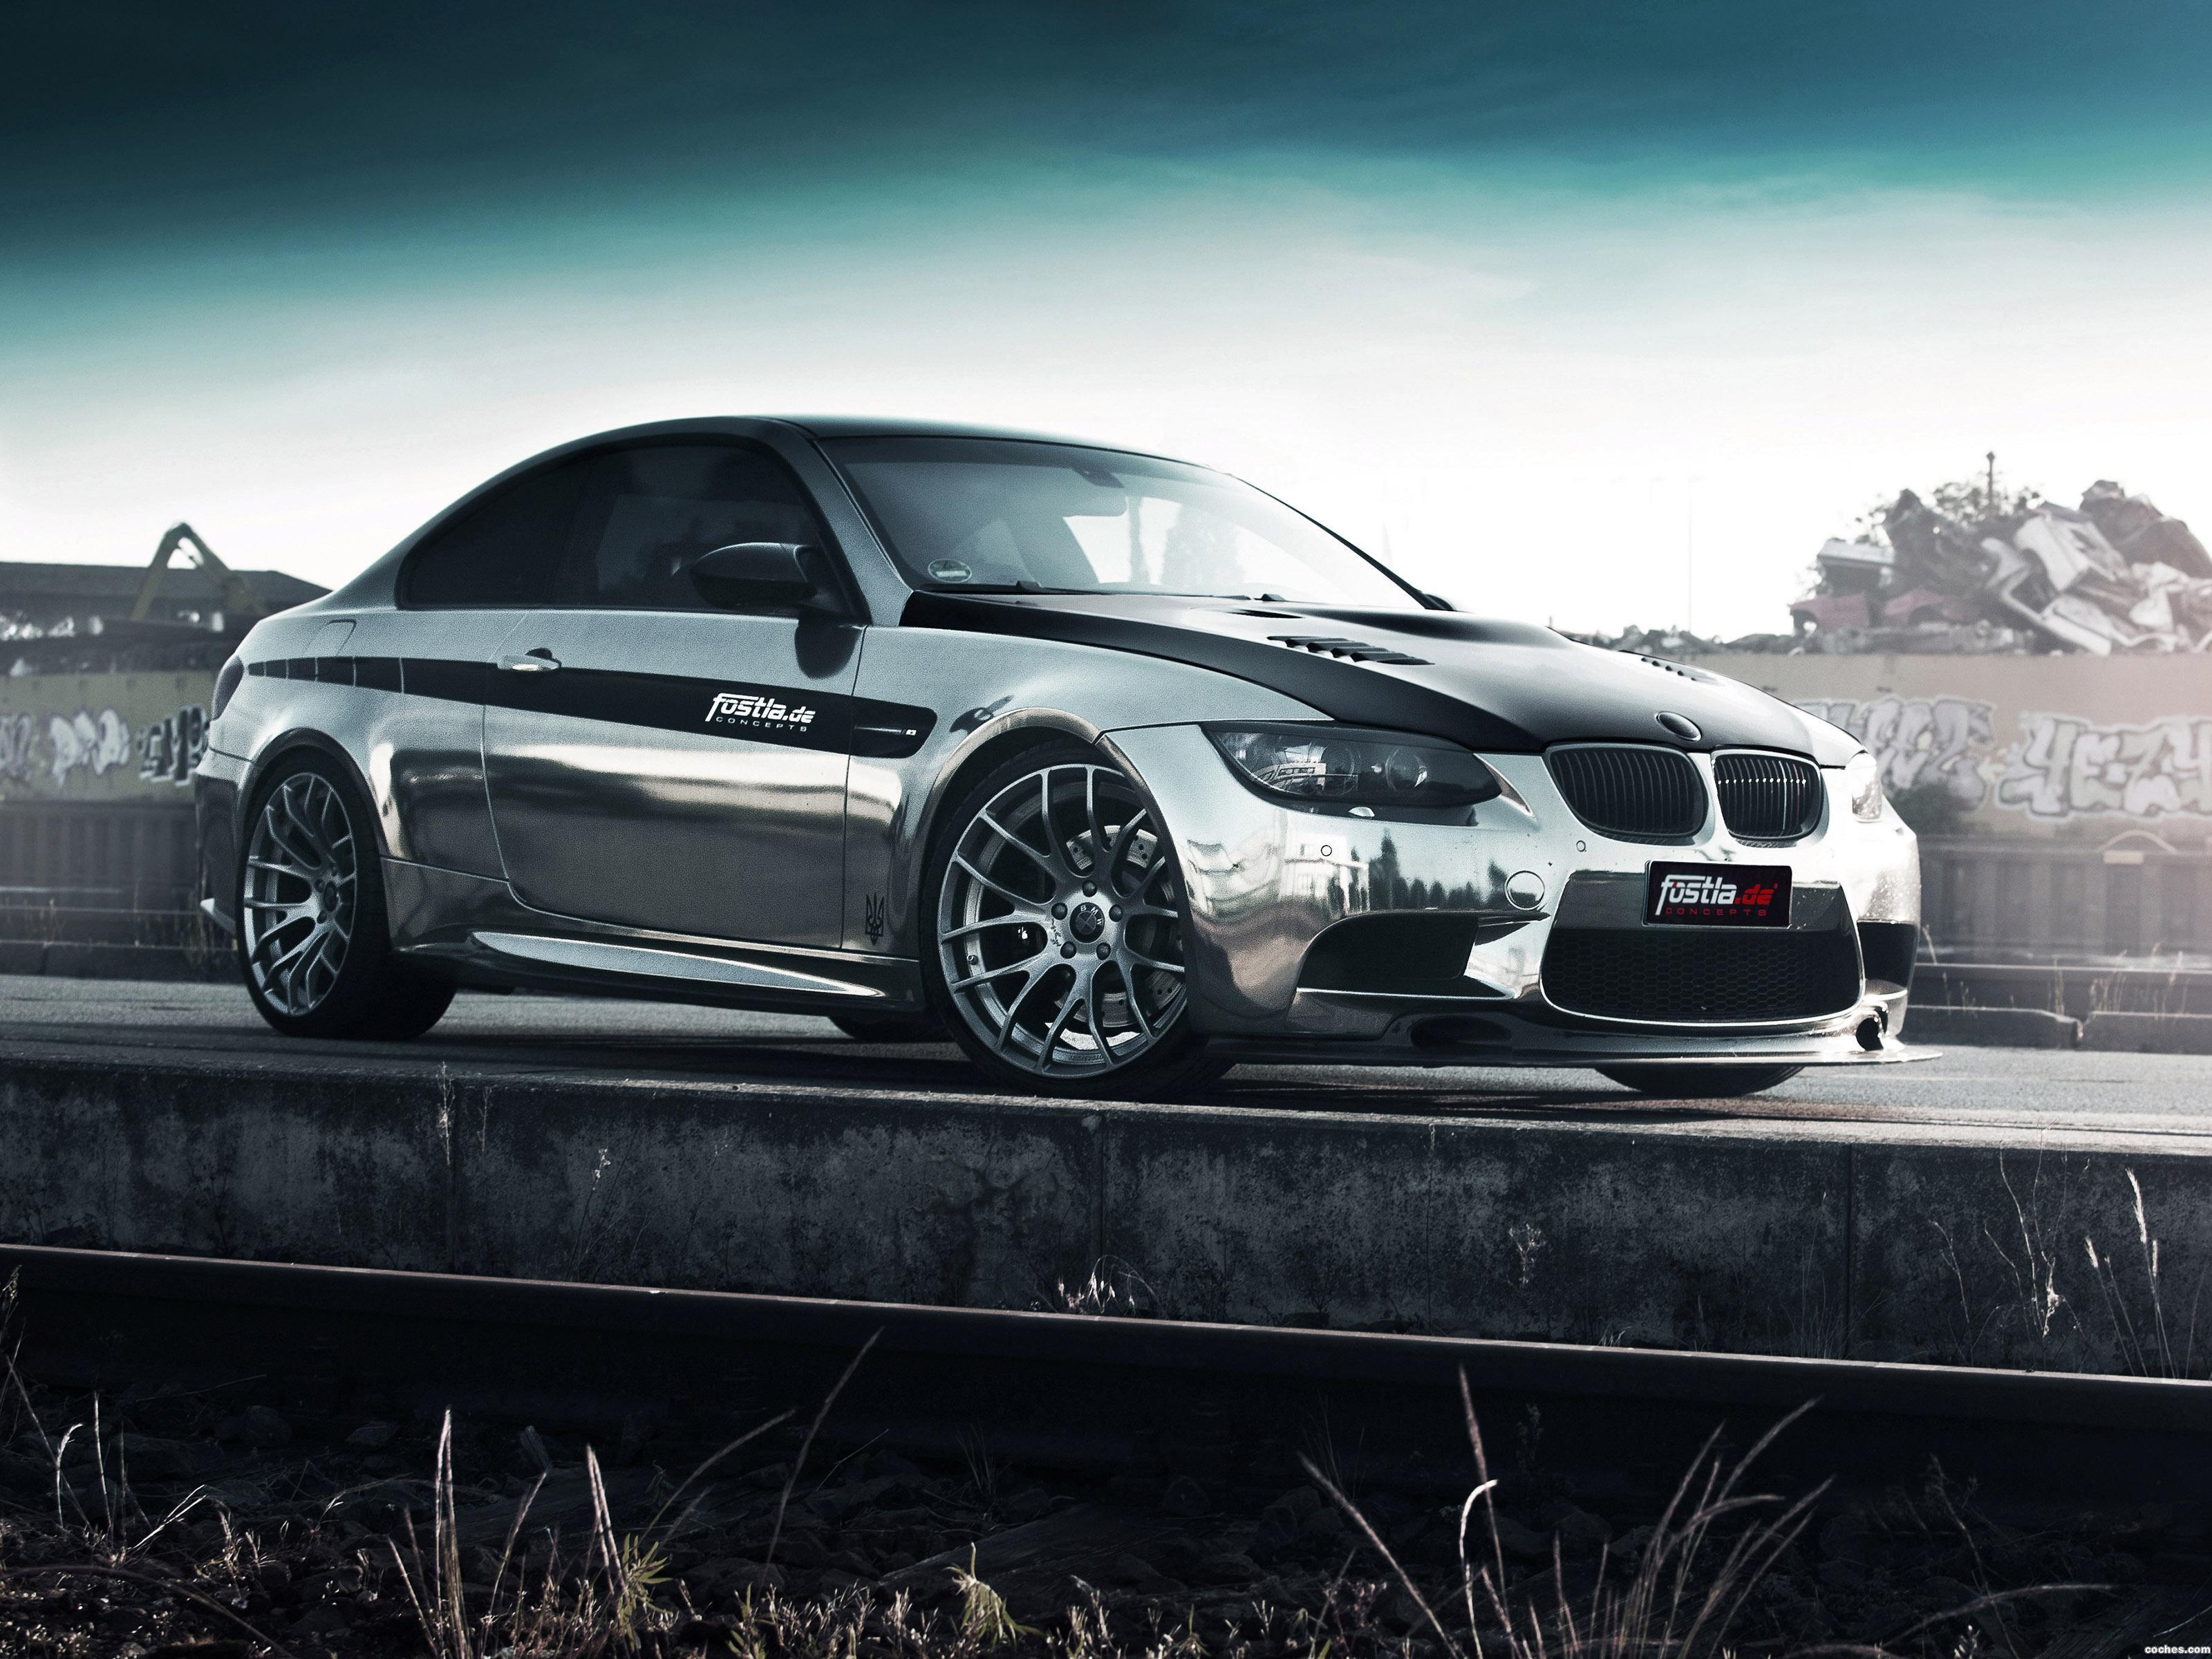 Foto 0 de Fostla BMW M3 Coupe E92 2016